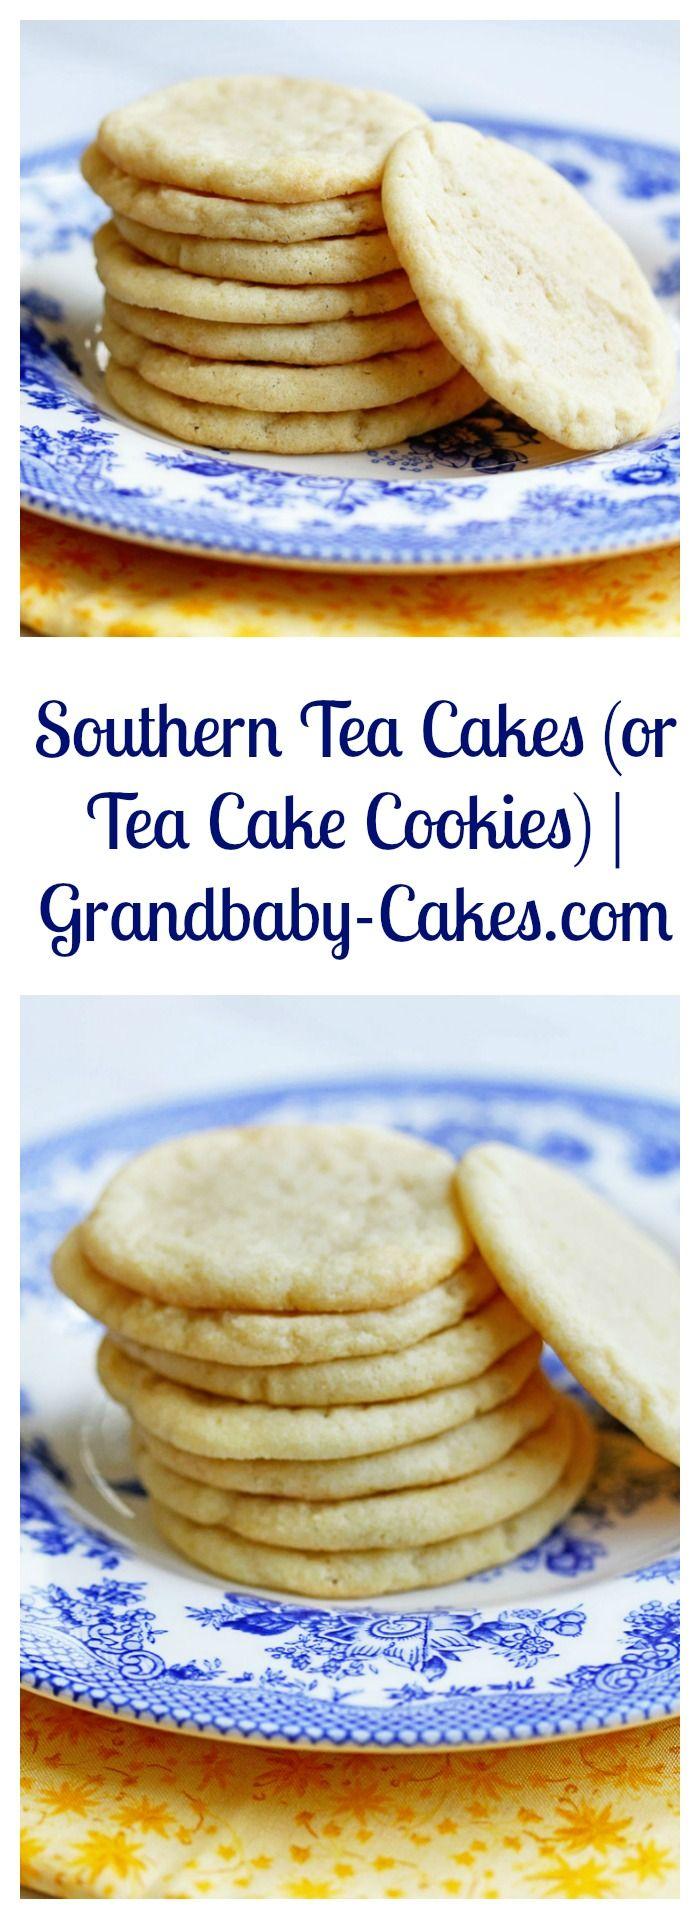 Easy and Classic Southern Tea Cakes Recipe | Grandbaby-Cakes.com